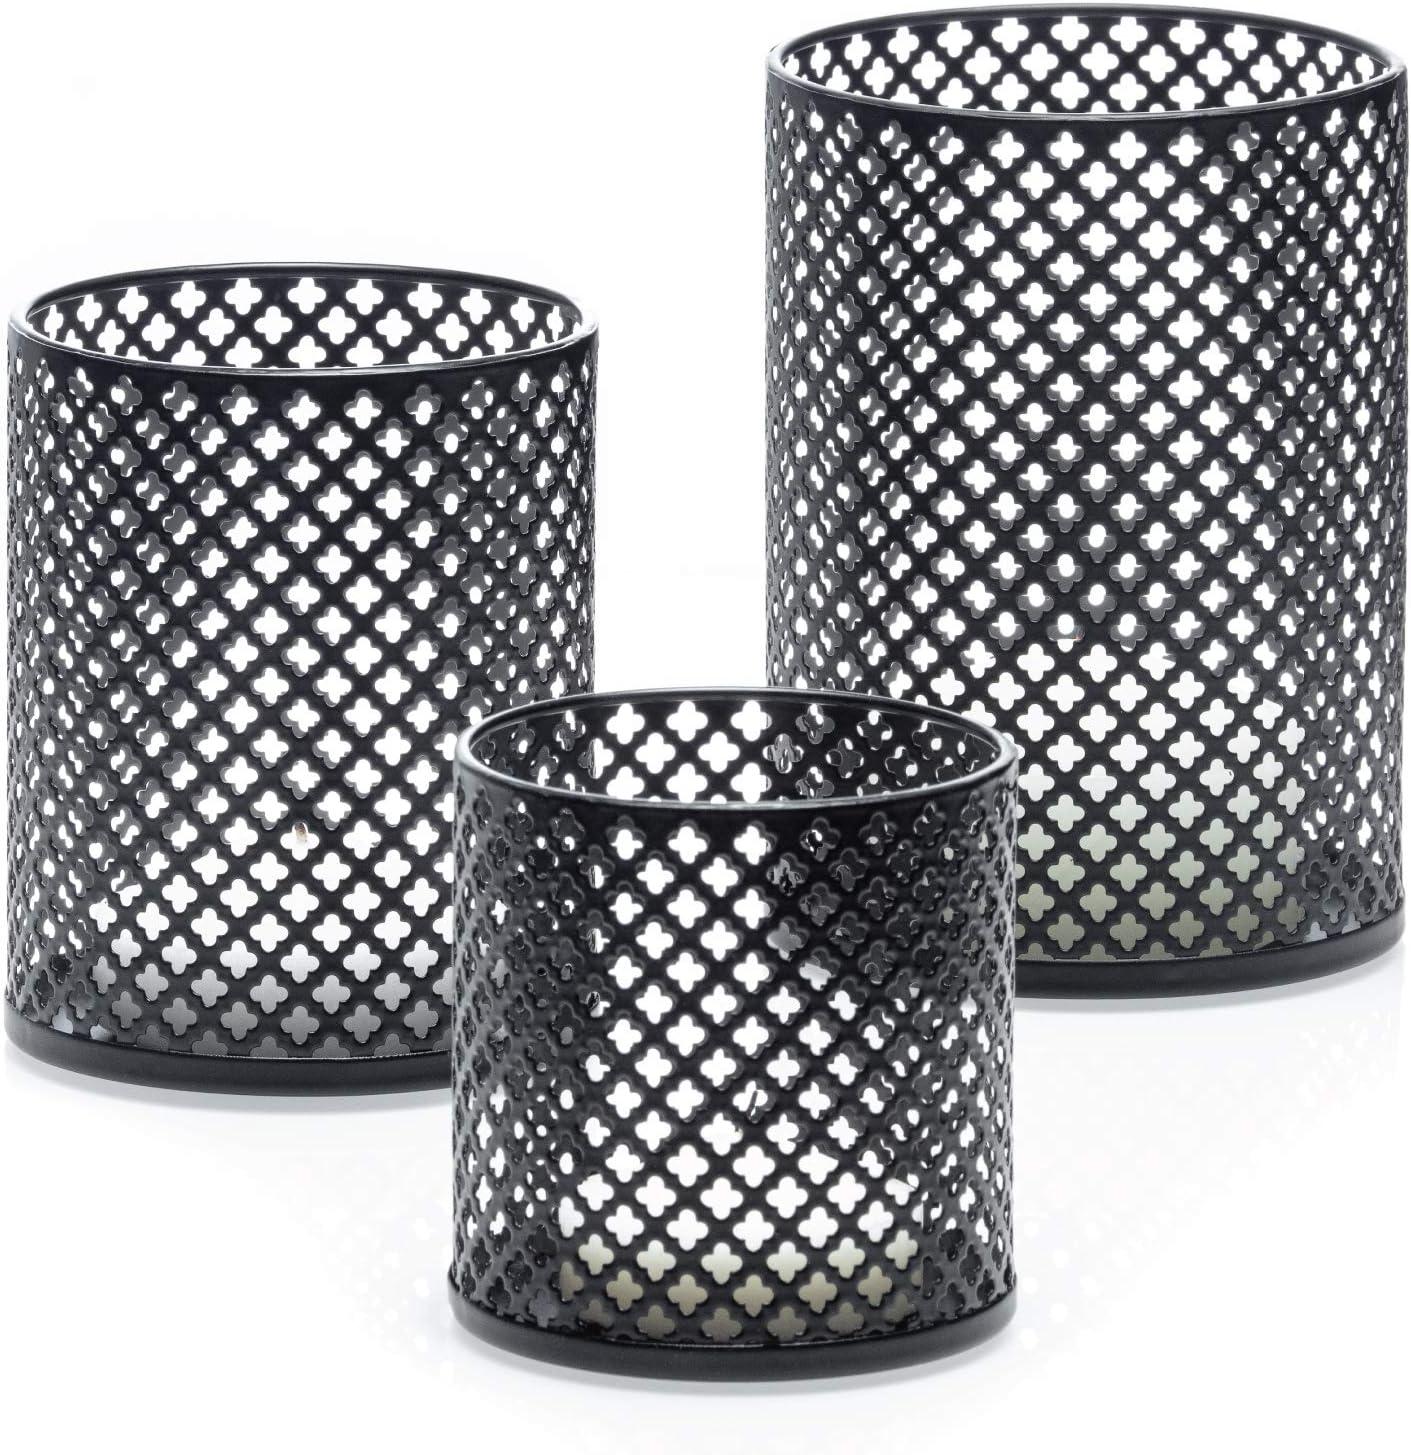 Velas Decorativas Candle Holder Centerpiece for Table Complementary 3 Votive Candles Home Decor Accents Elegant Matte Black Finish Decorative Metal Candle Holders Set of 3